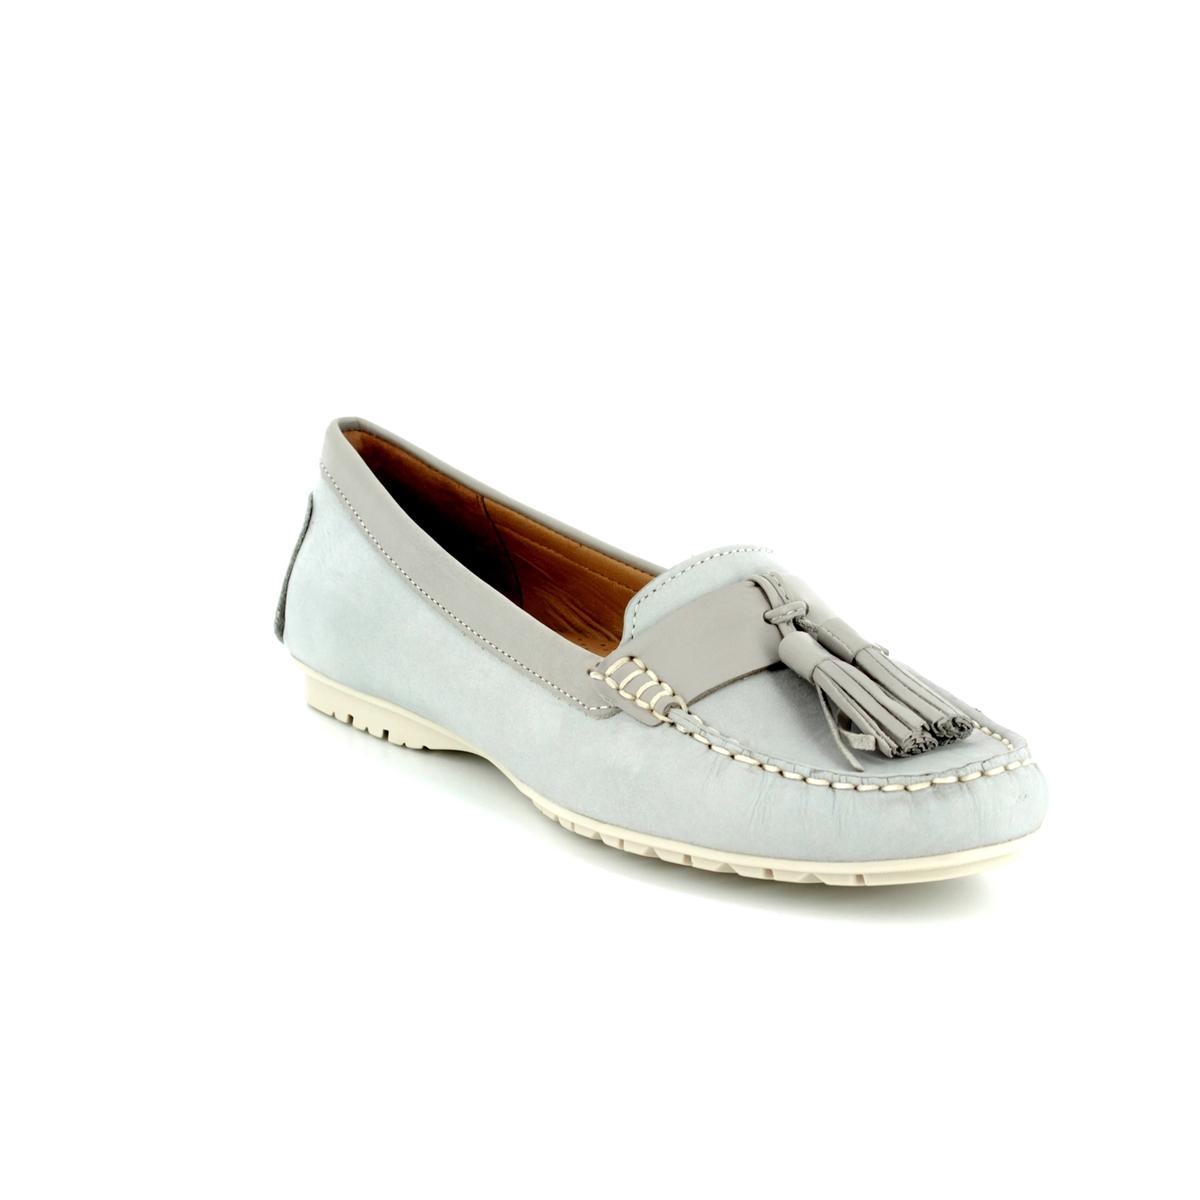 7ad0d3d19e44 Ambition Loafers - Light Grey - 25816 20 ANTONIA TASSLE